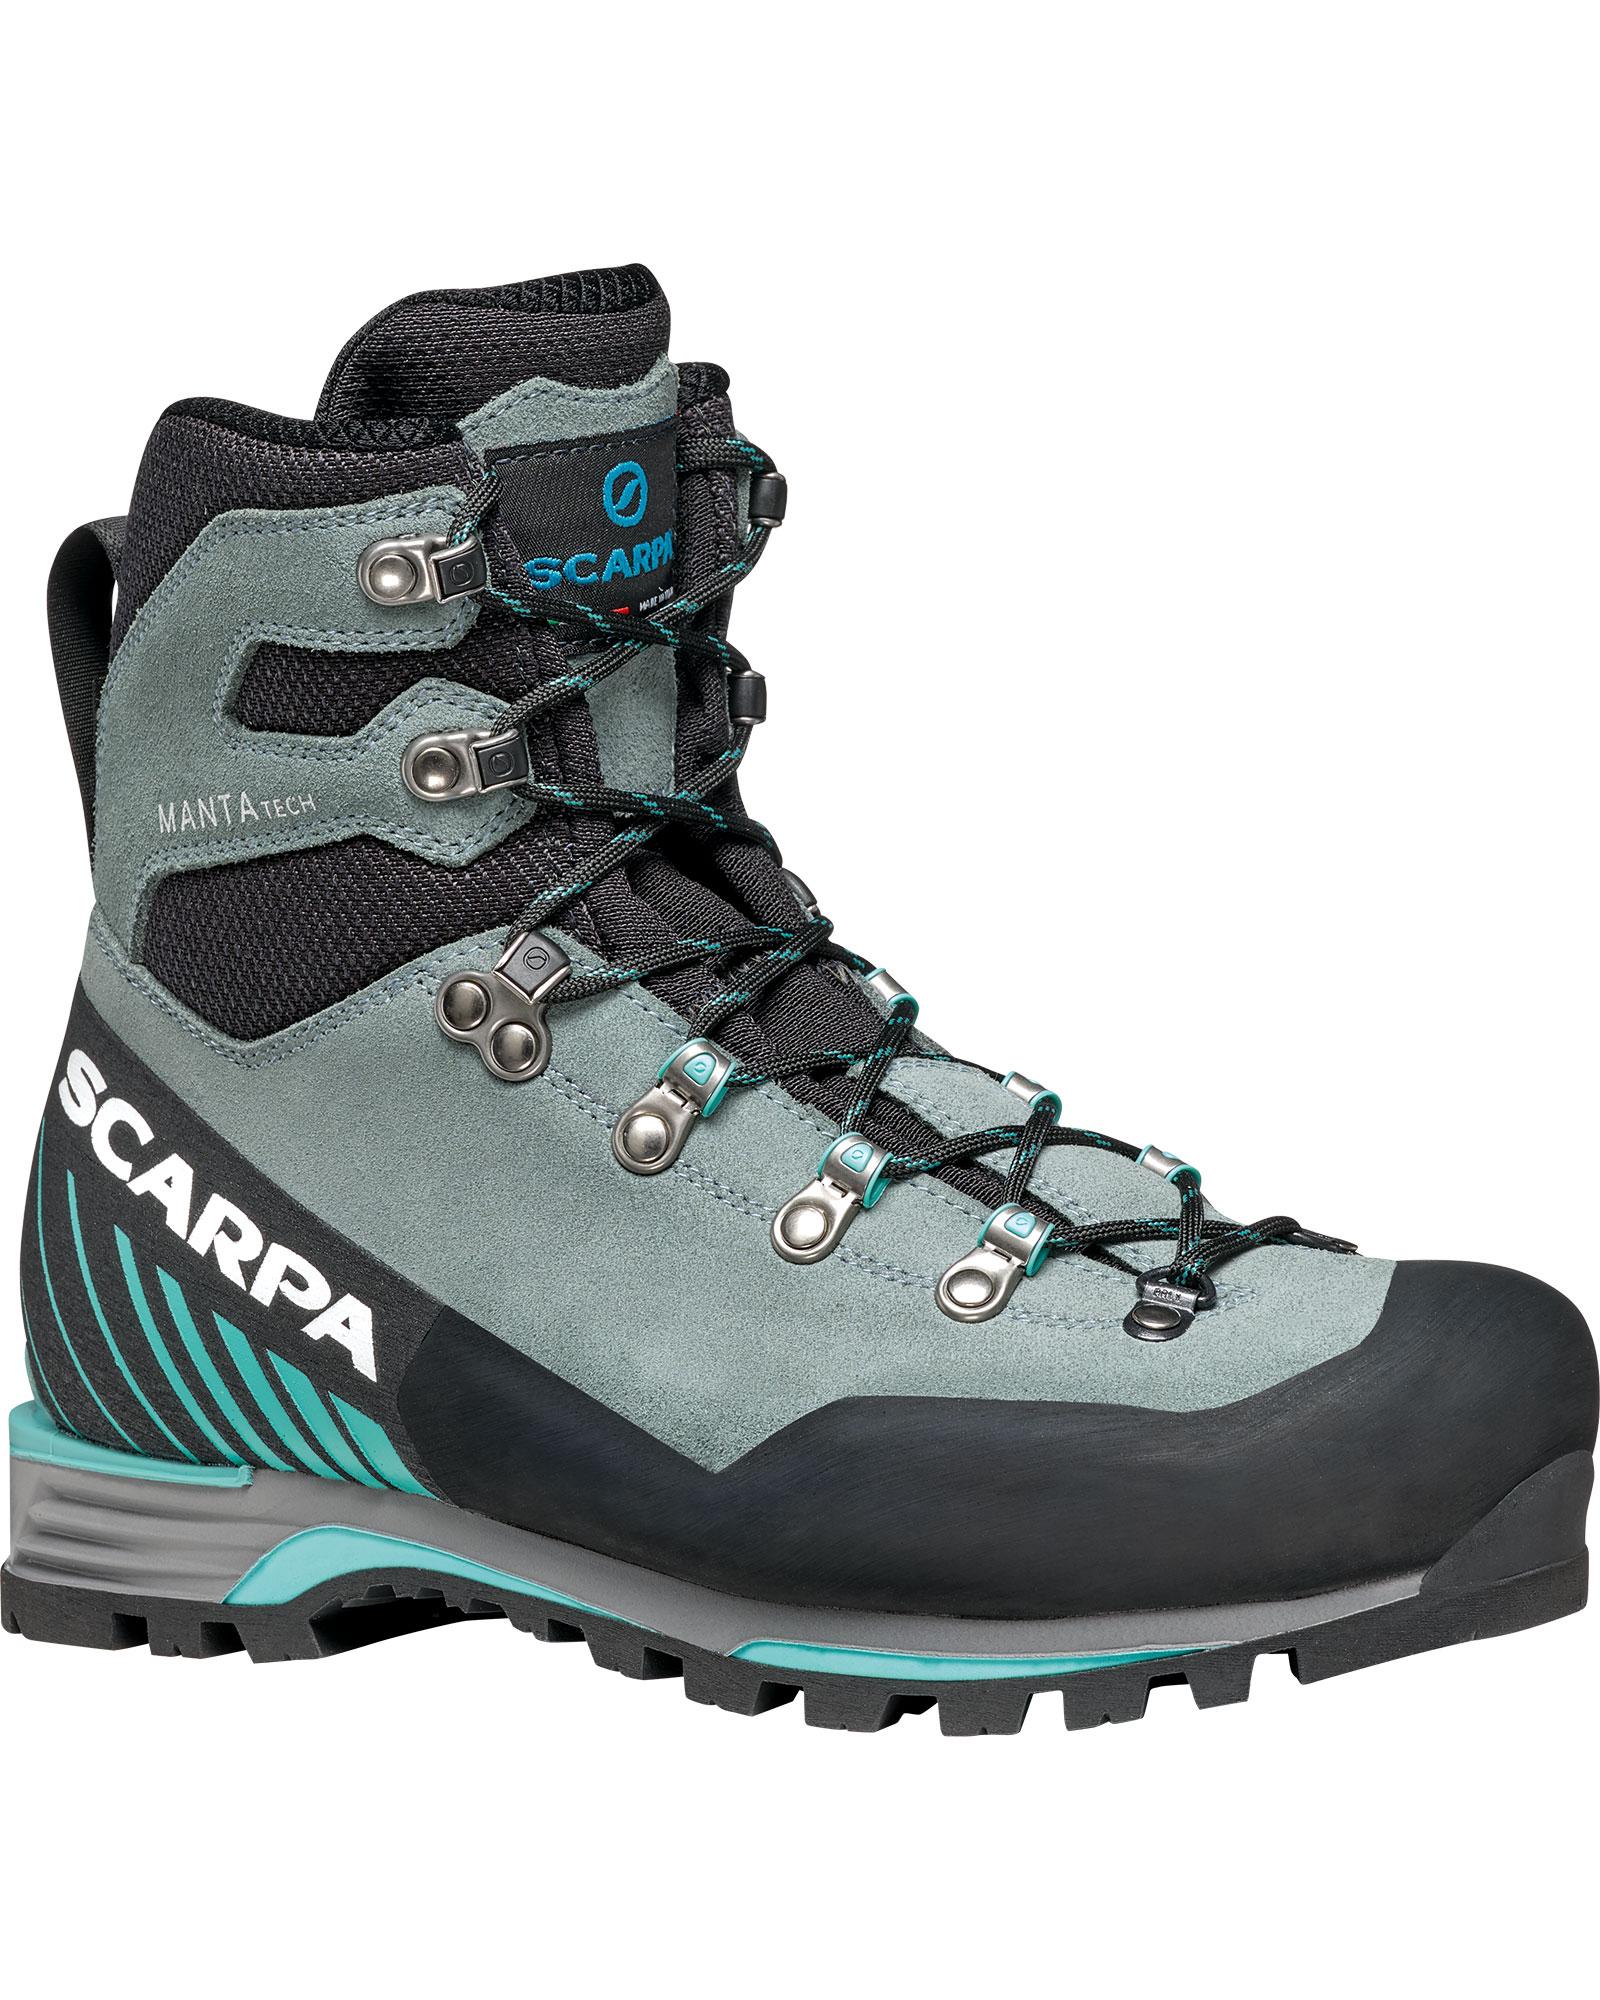 Scarpa Women's Manta Tech GORE-TEX Mountaineering Boots 0